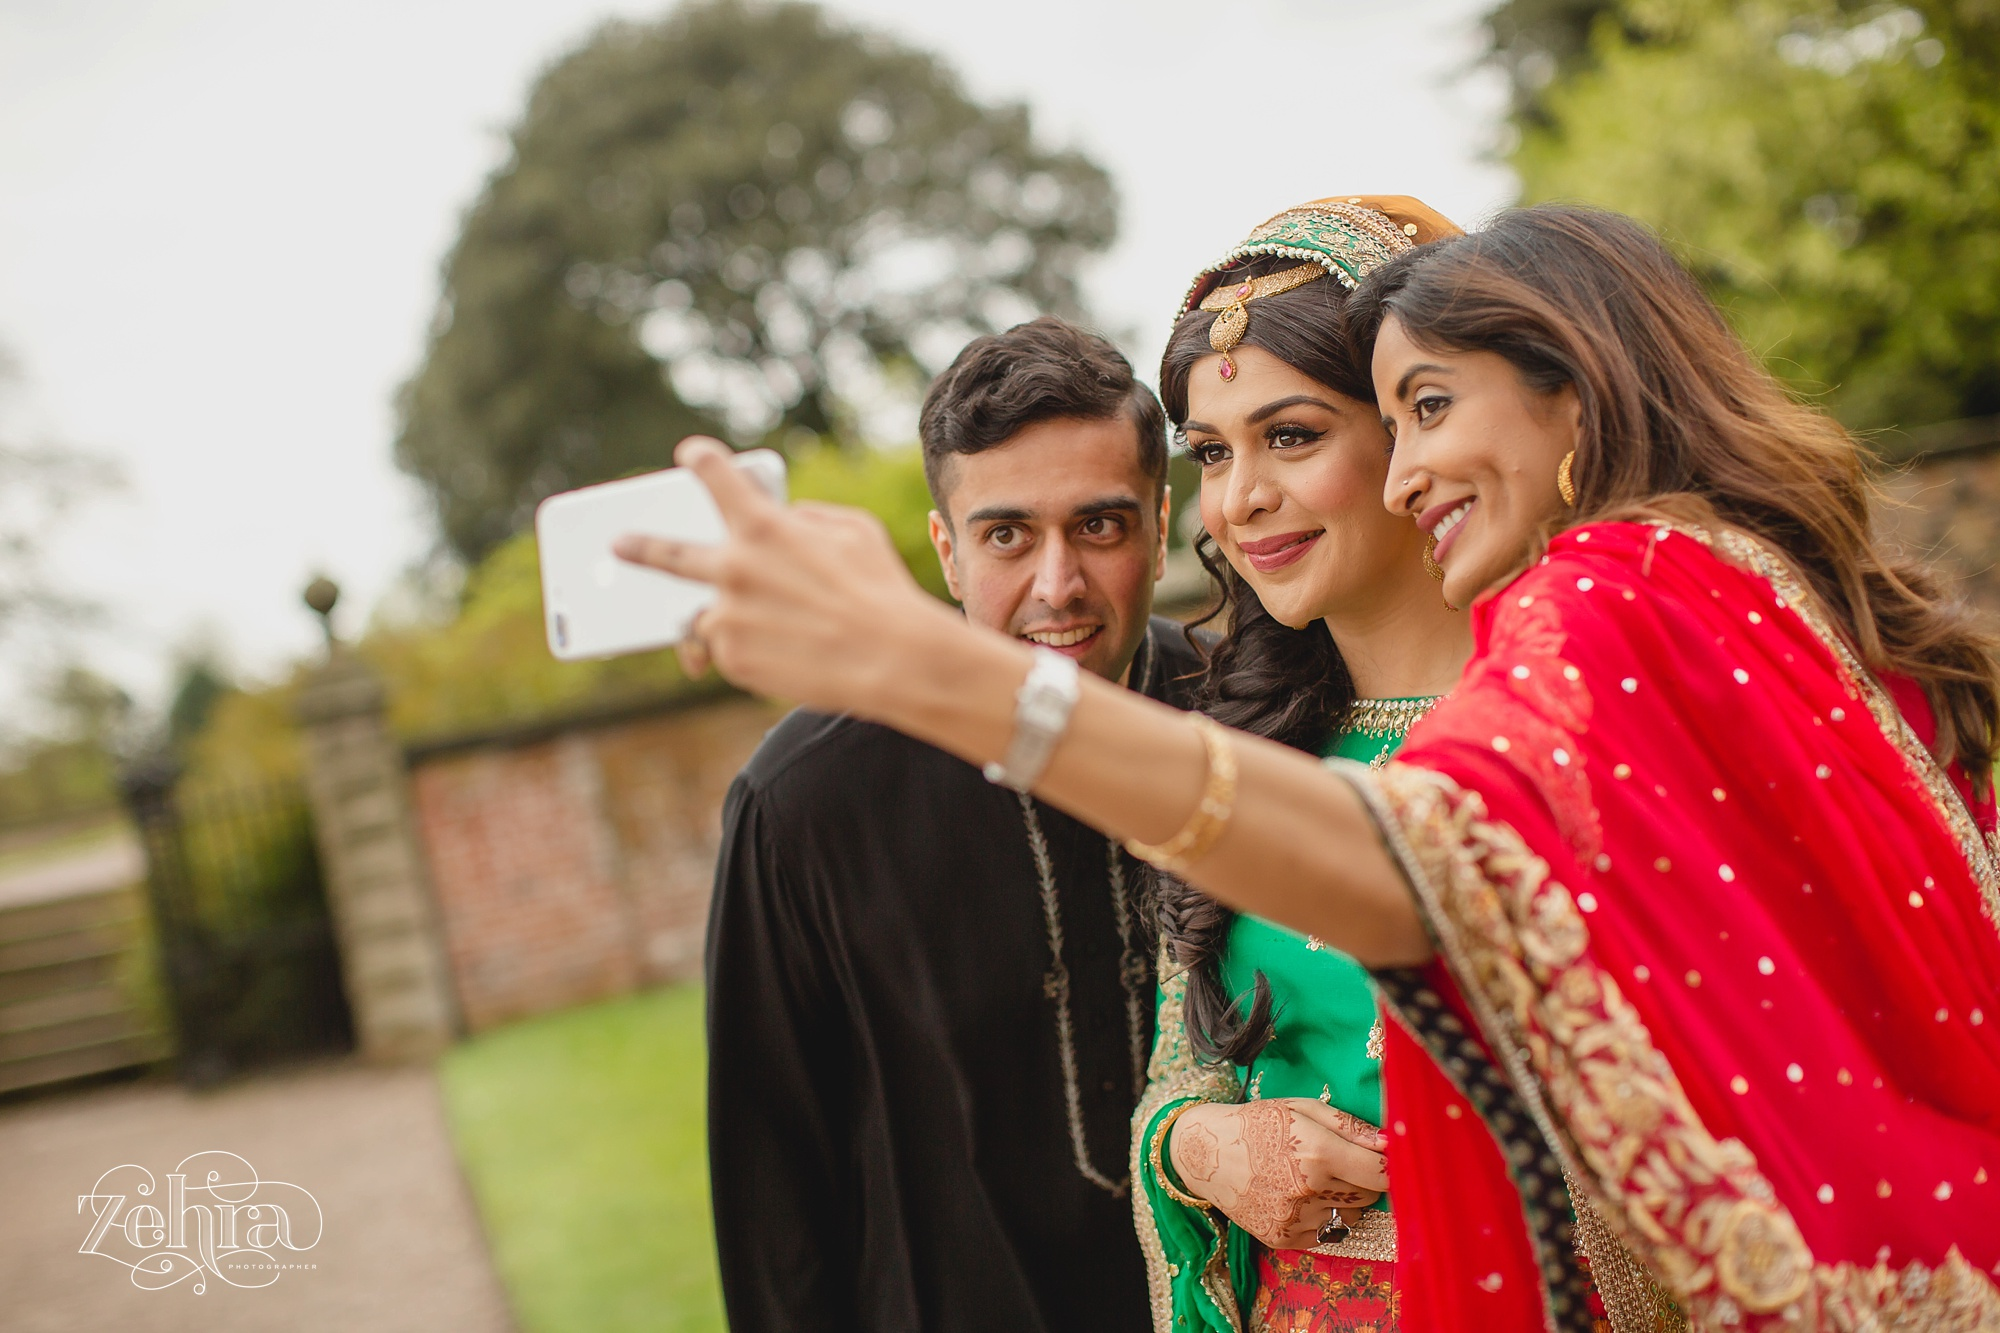 zehra wedding photographer arley hall cheshire021.jpg